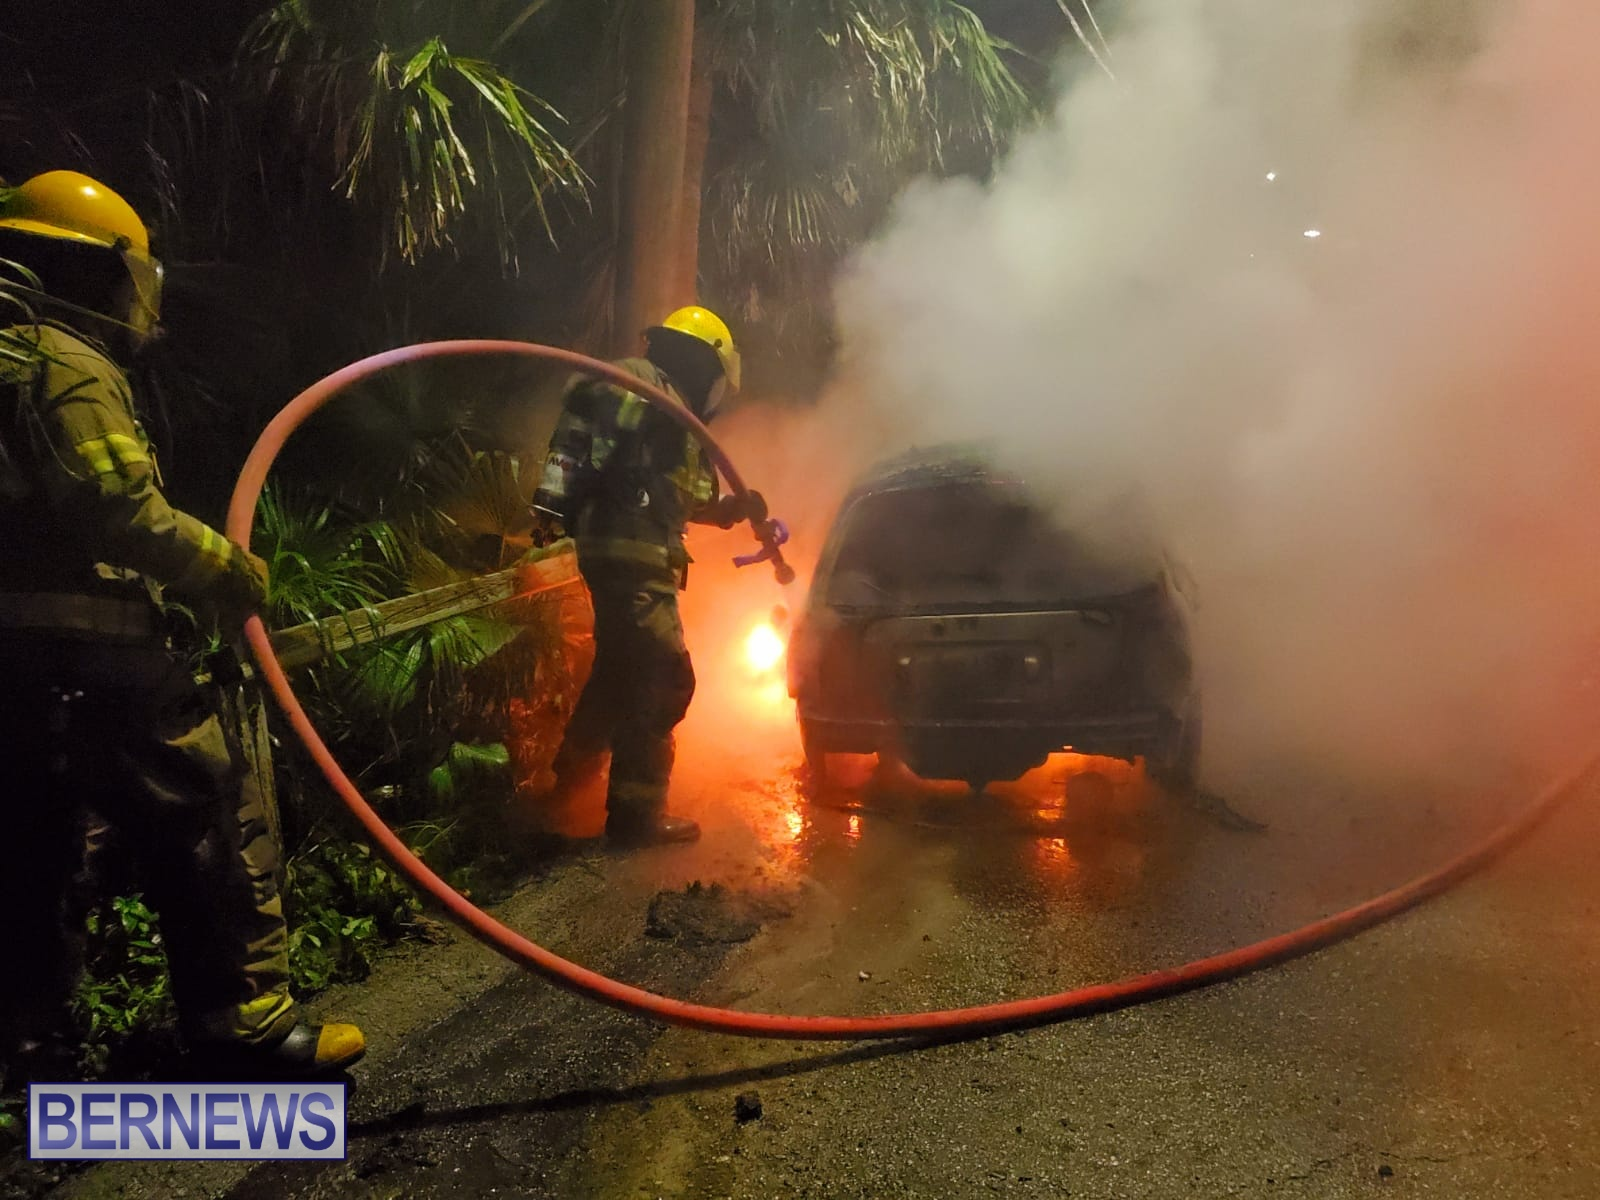 Bermuda firefighters extinguish car fire Dec 2020 (4)